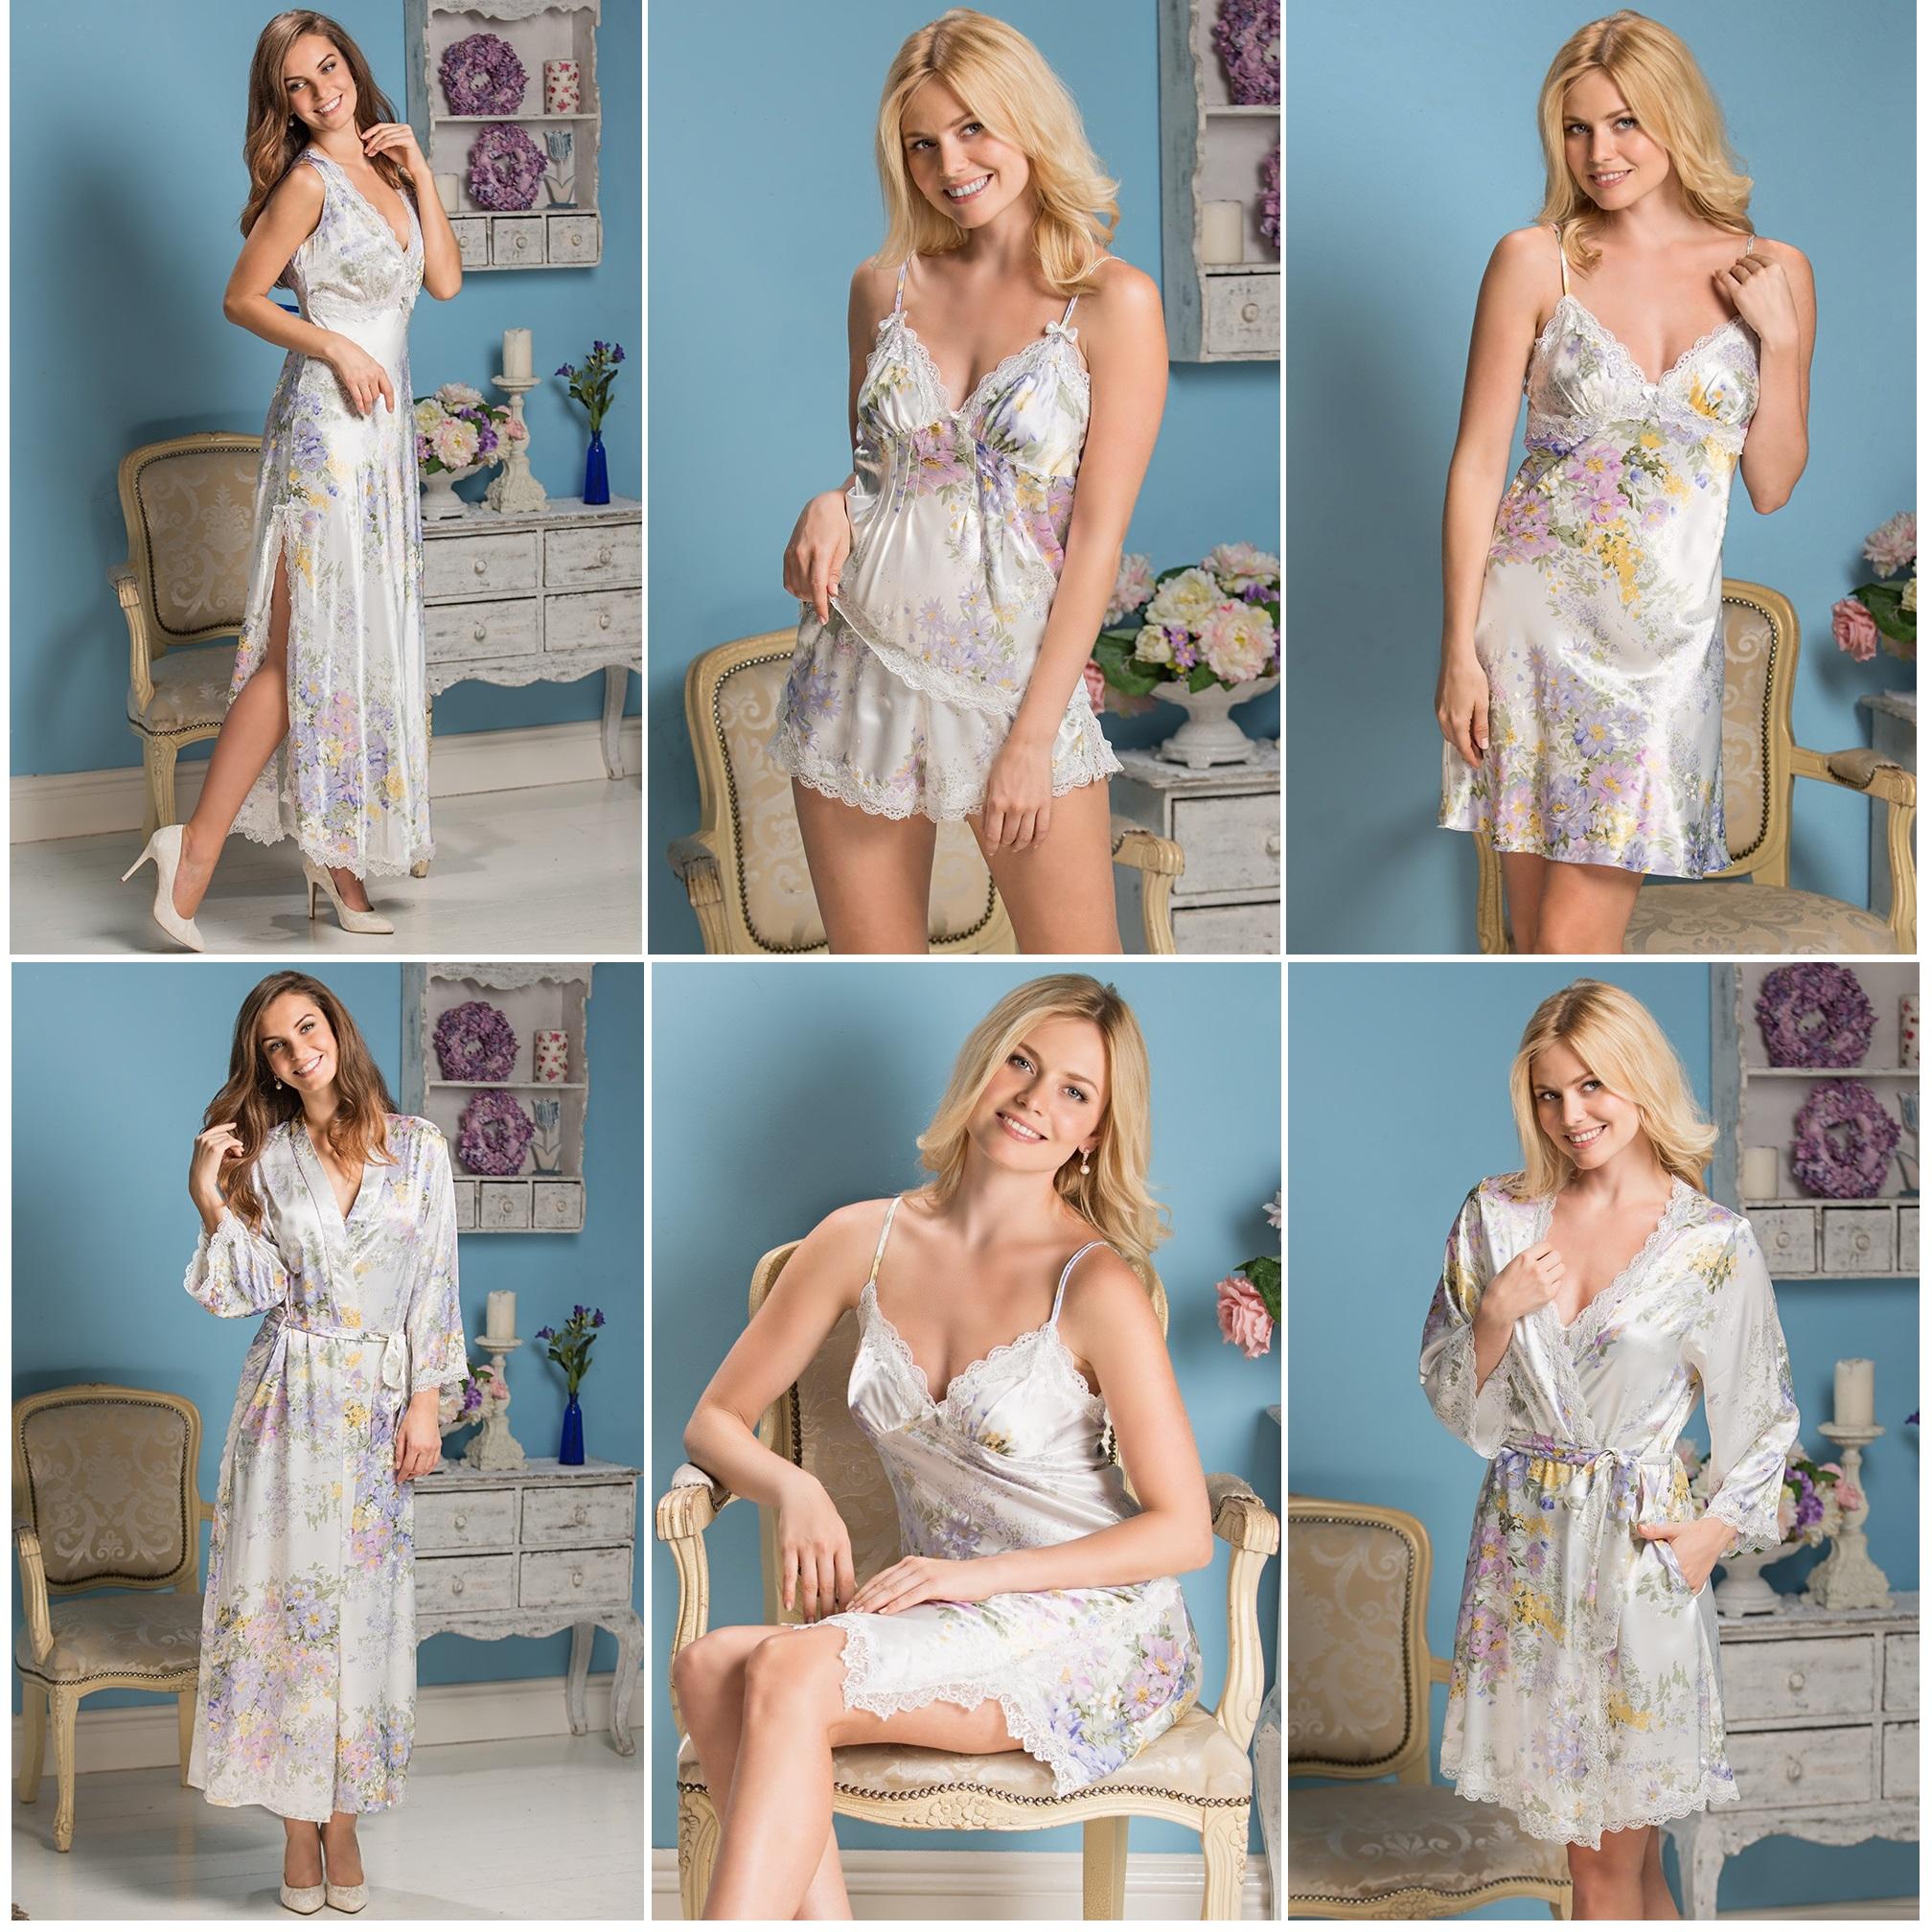 Женские сорочки, халаты, комплекты Lilianna Mia-Mia купить интернет-магазин